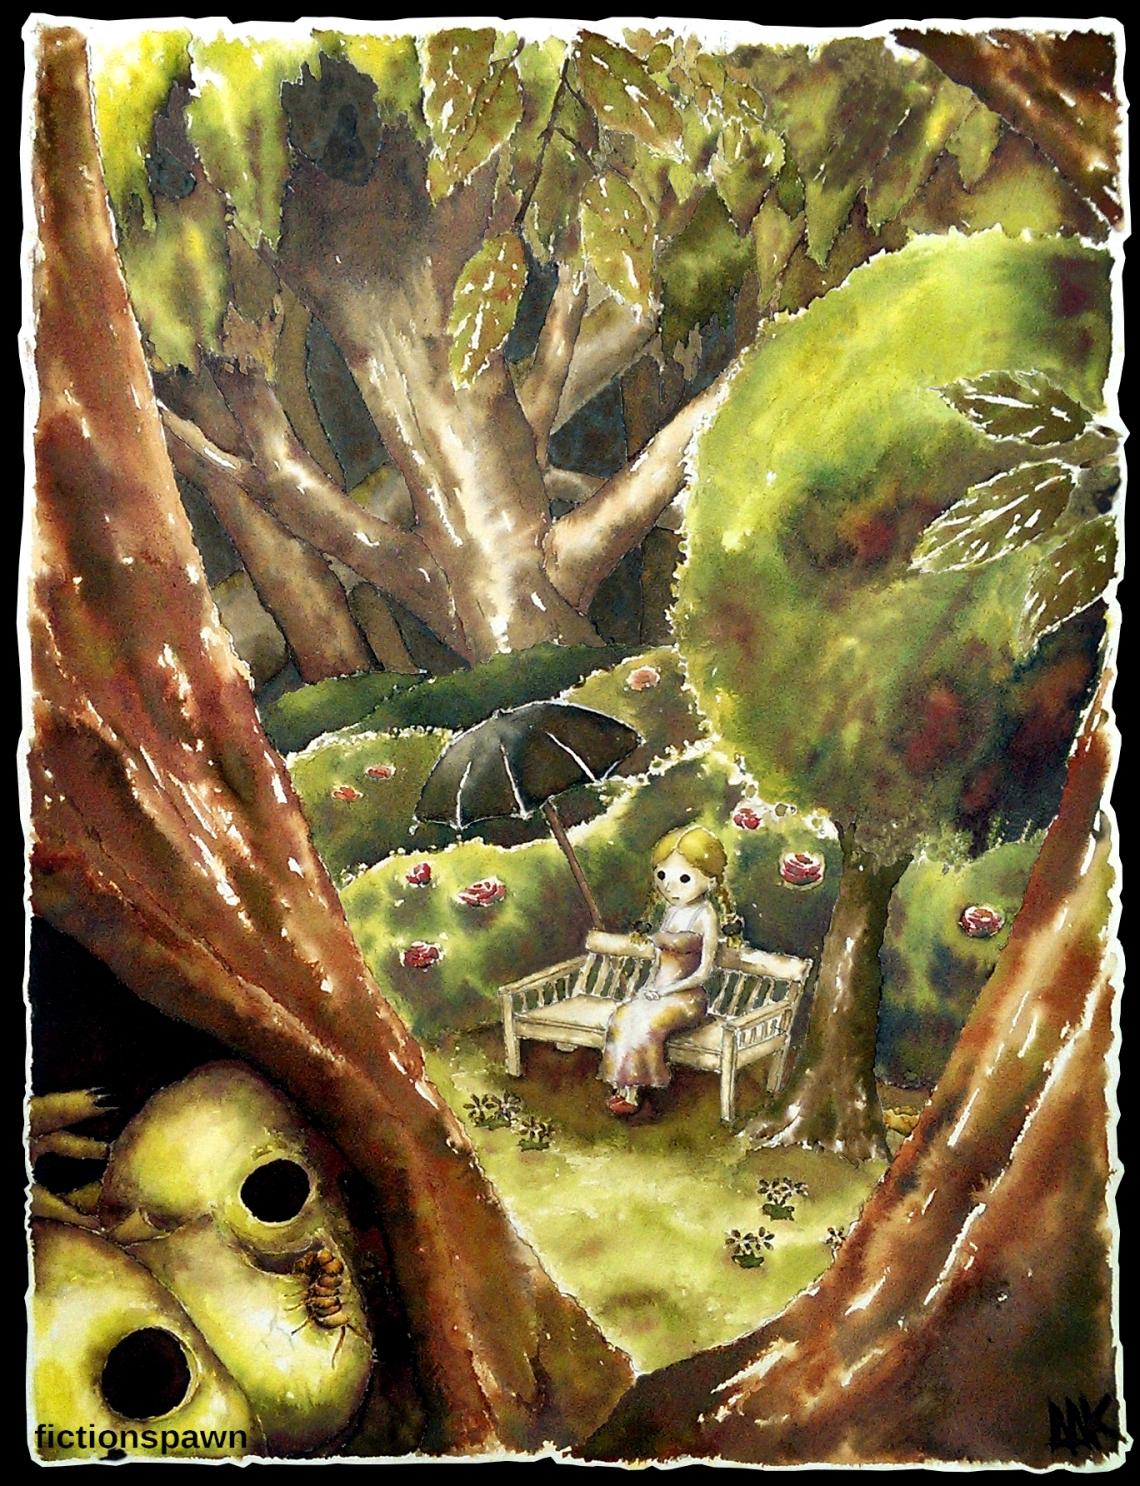 Girls in a dark forest. Skulls. Aak fictionspawn.